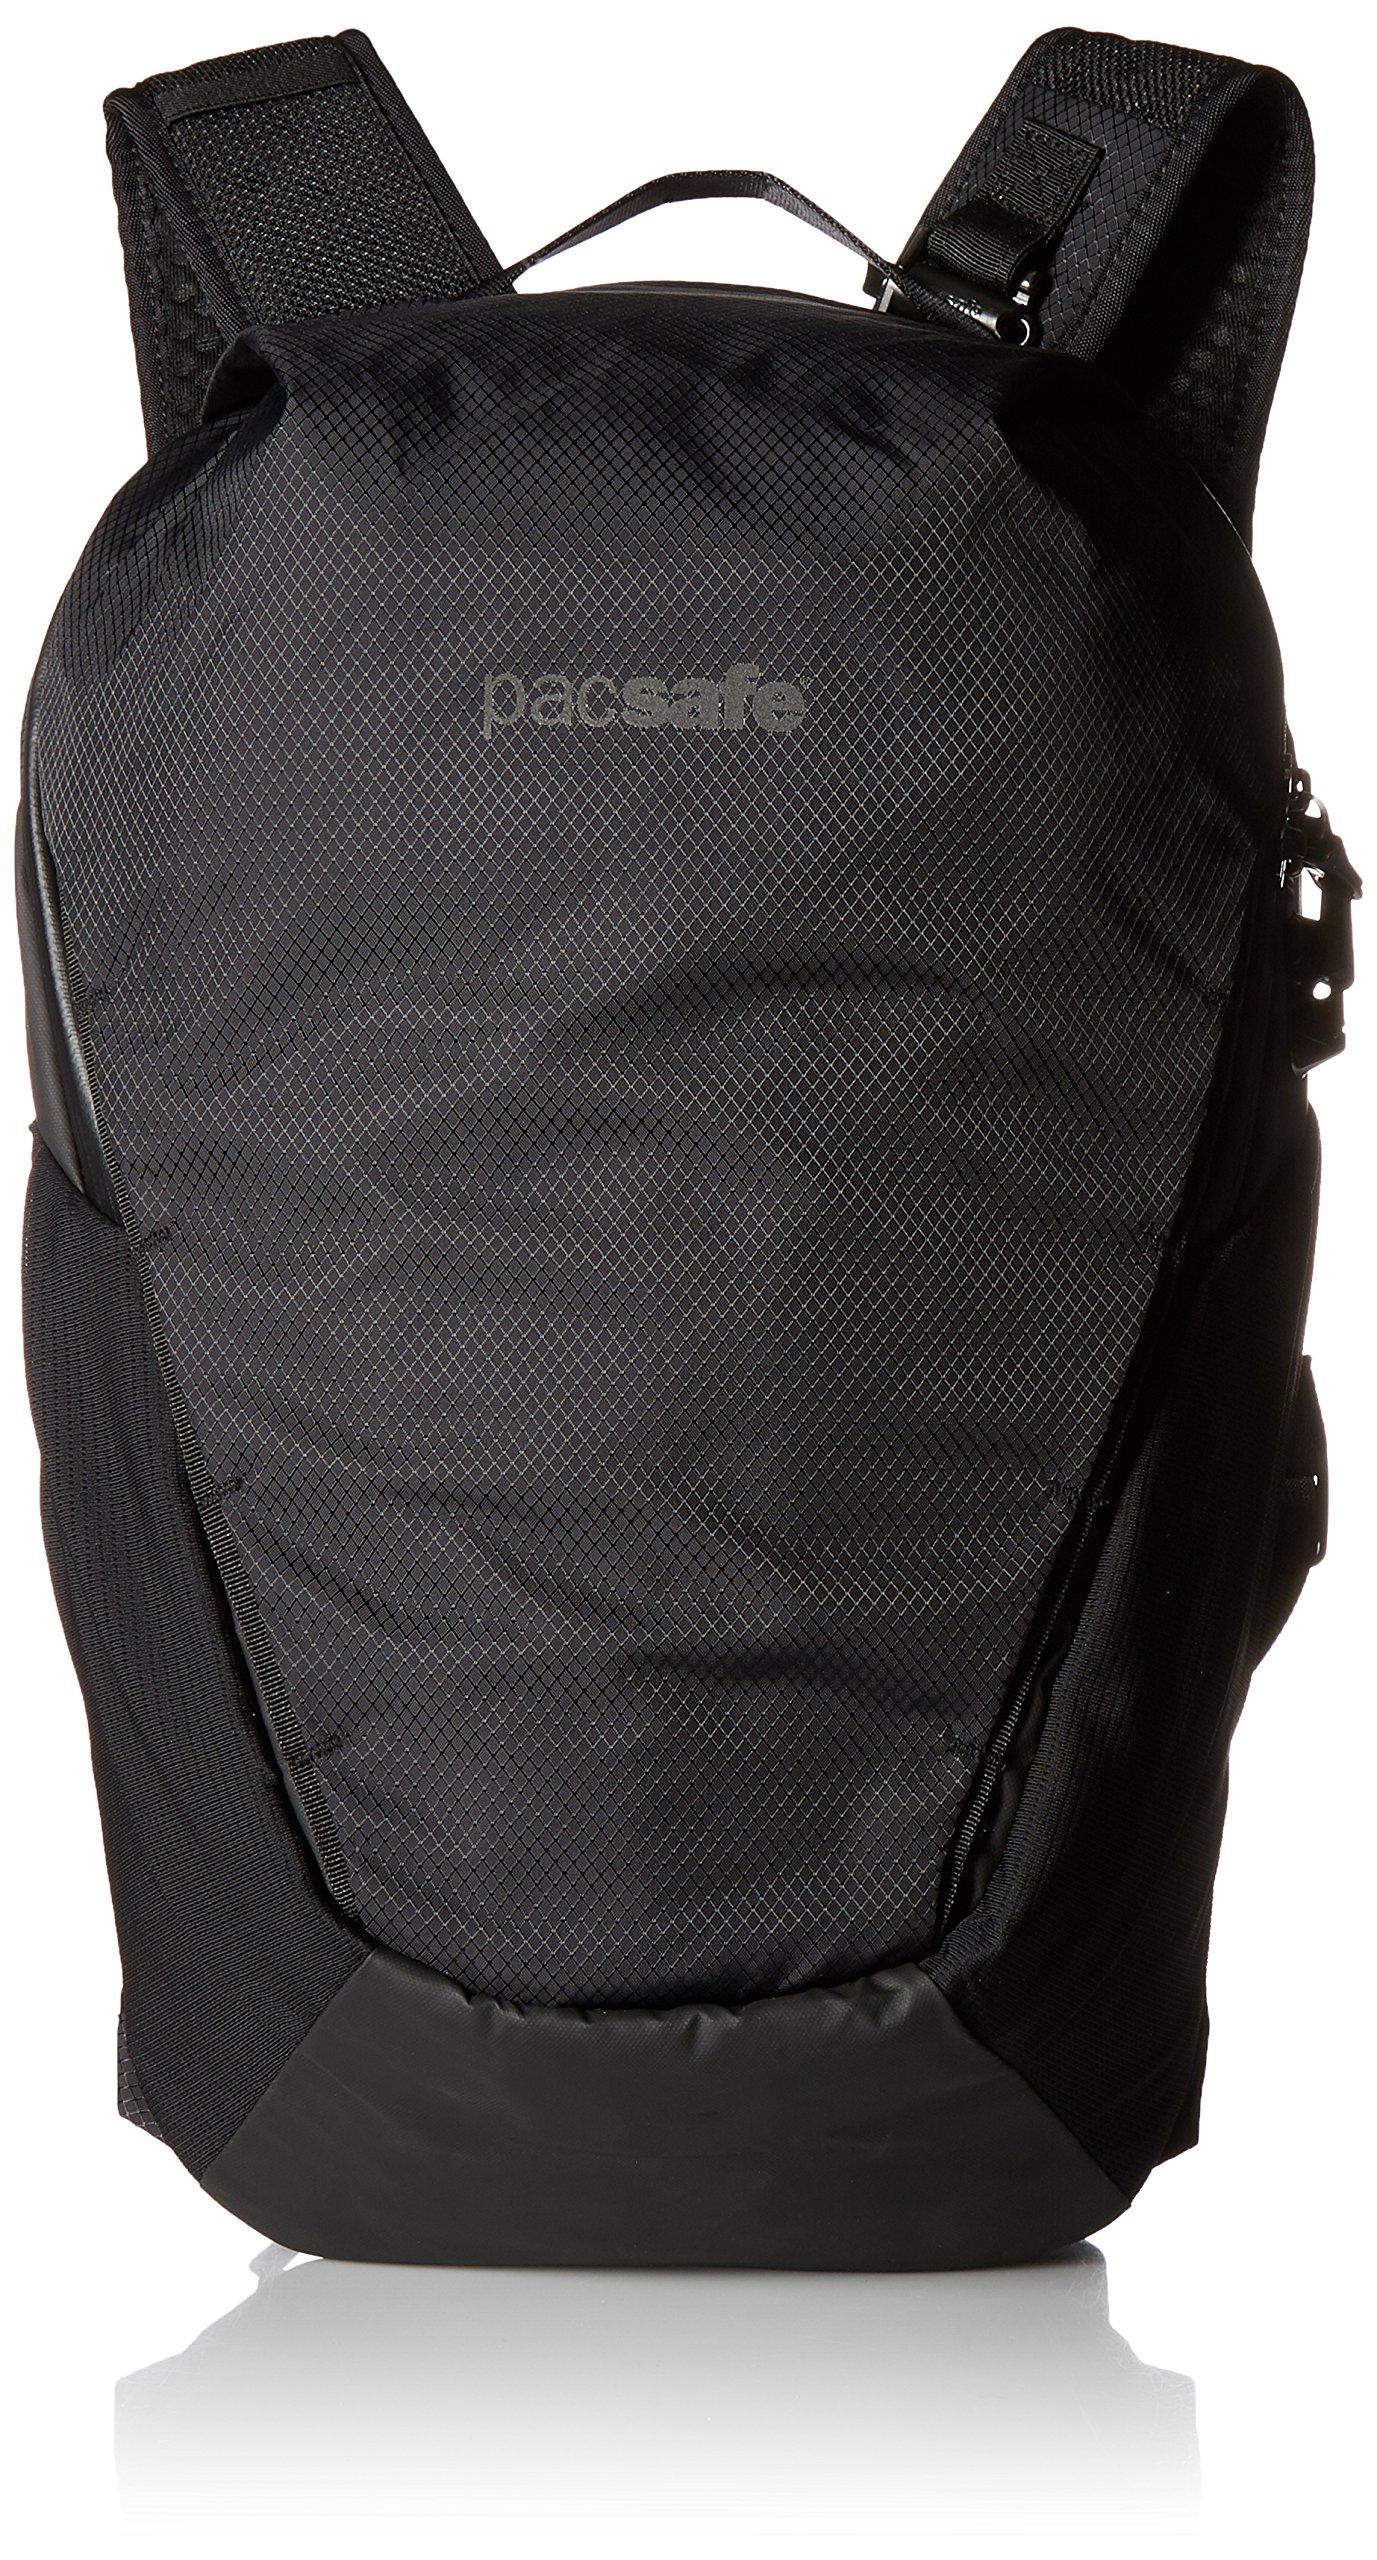 Pacsafe Venturesafe X18 Anti-theft Backpack (Black) by Pacsafe